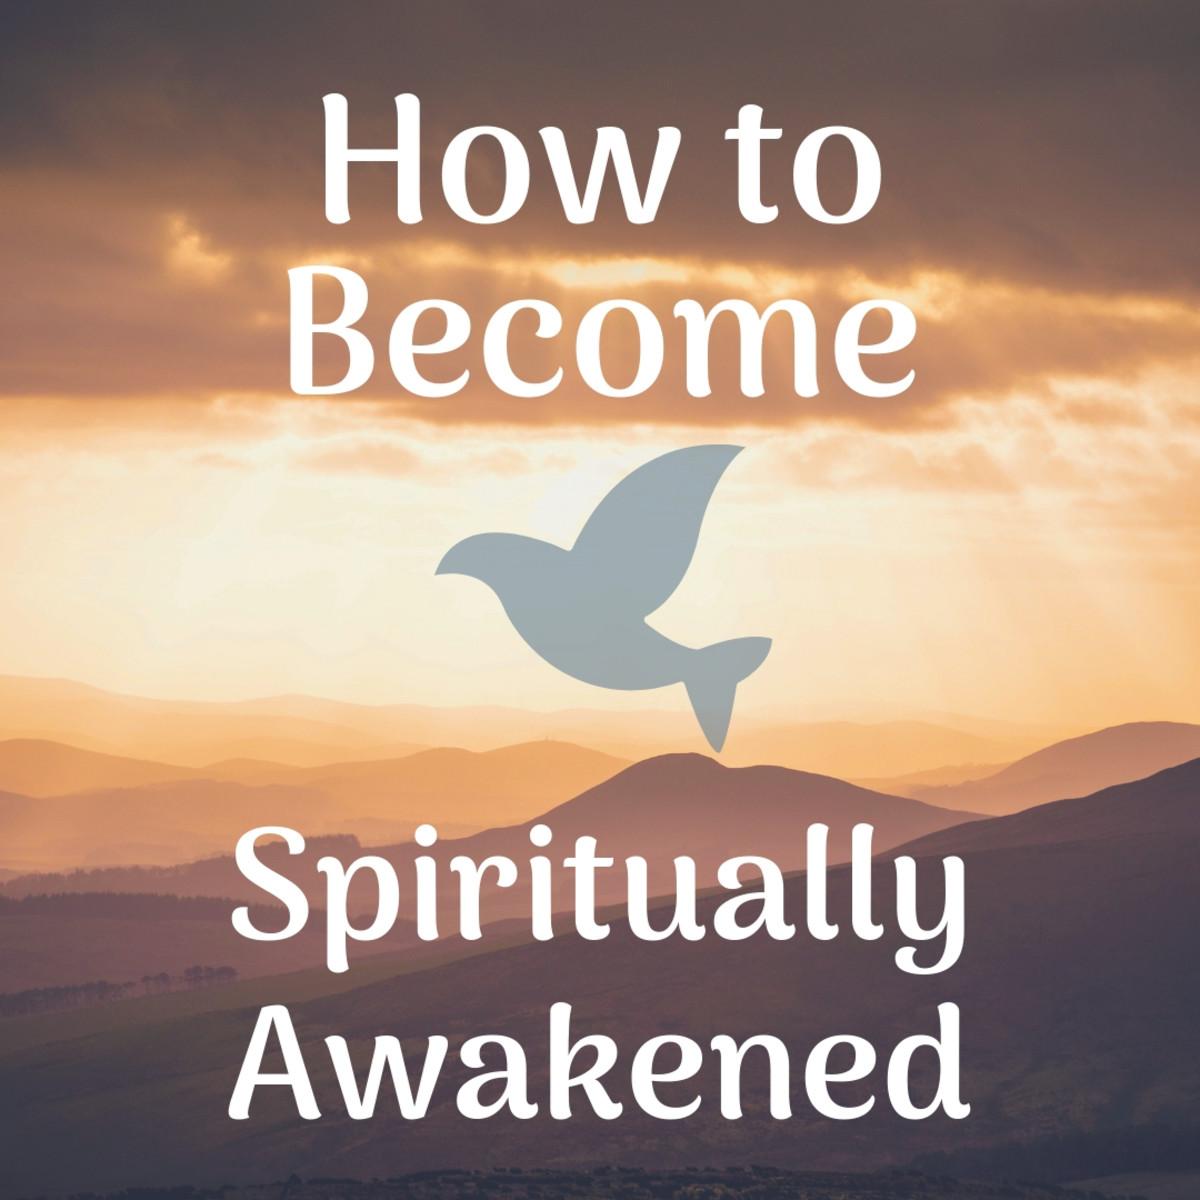 spiritual-awakening-and-characteristics-of-a-spiritually-awakened-person